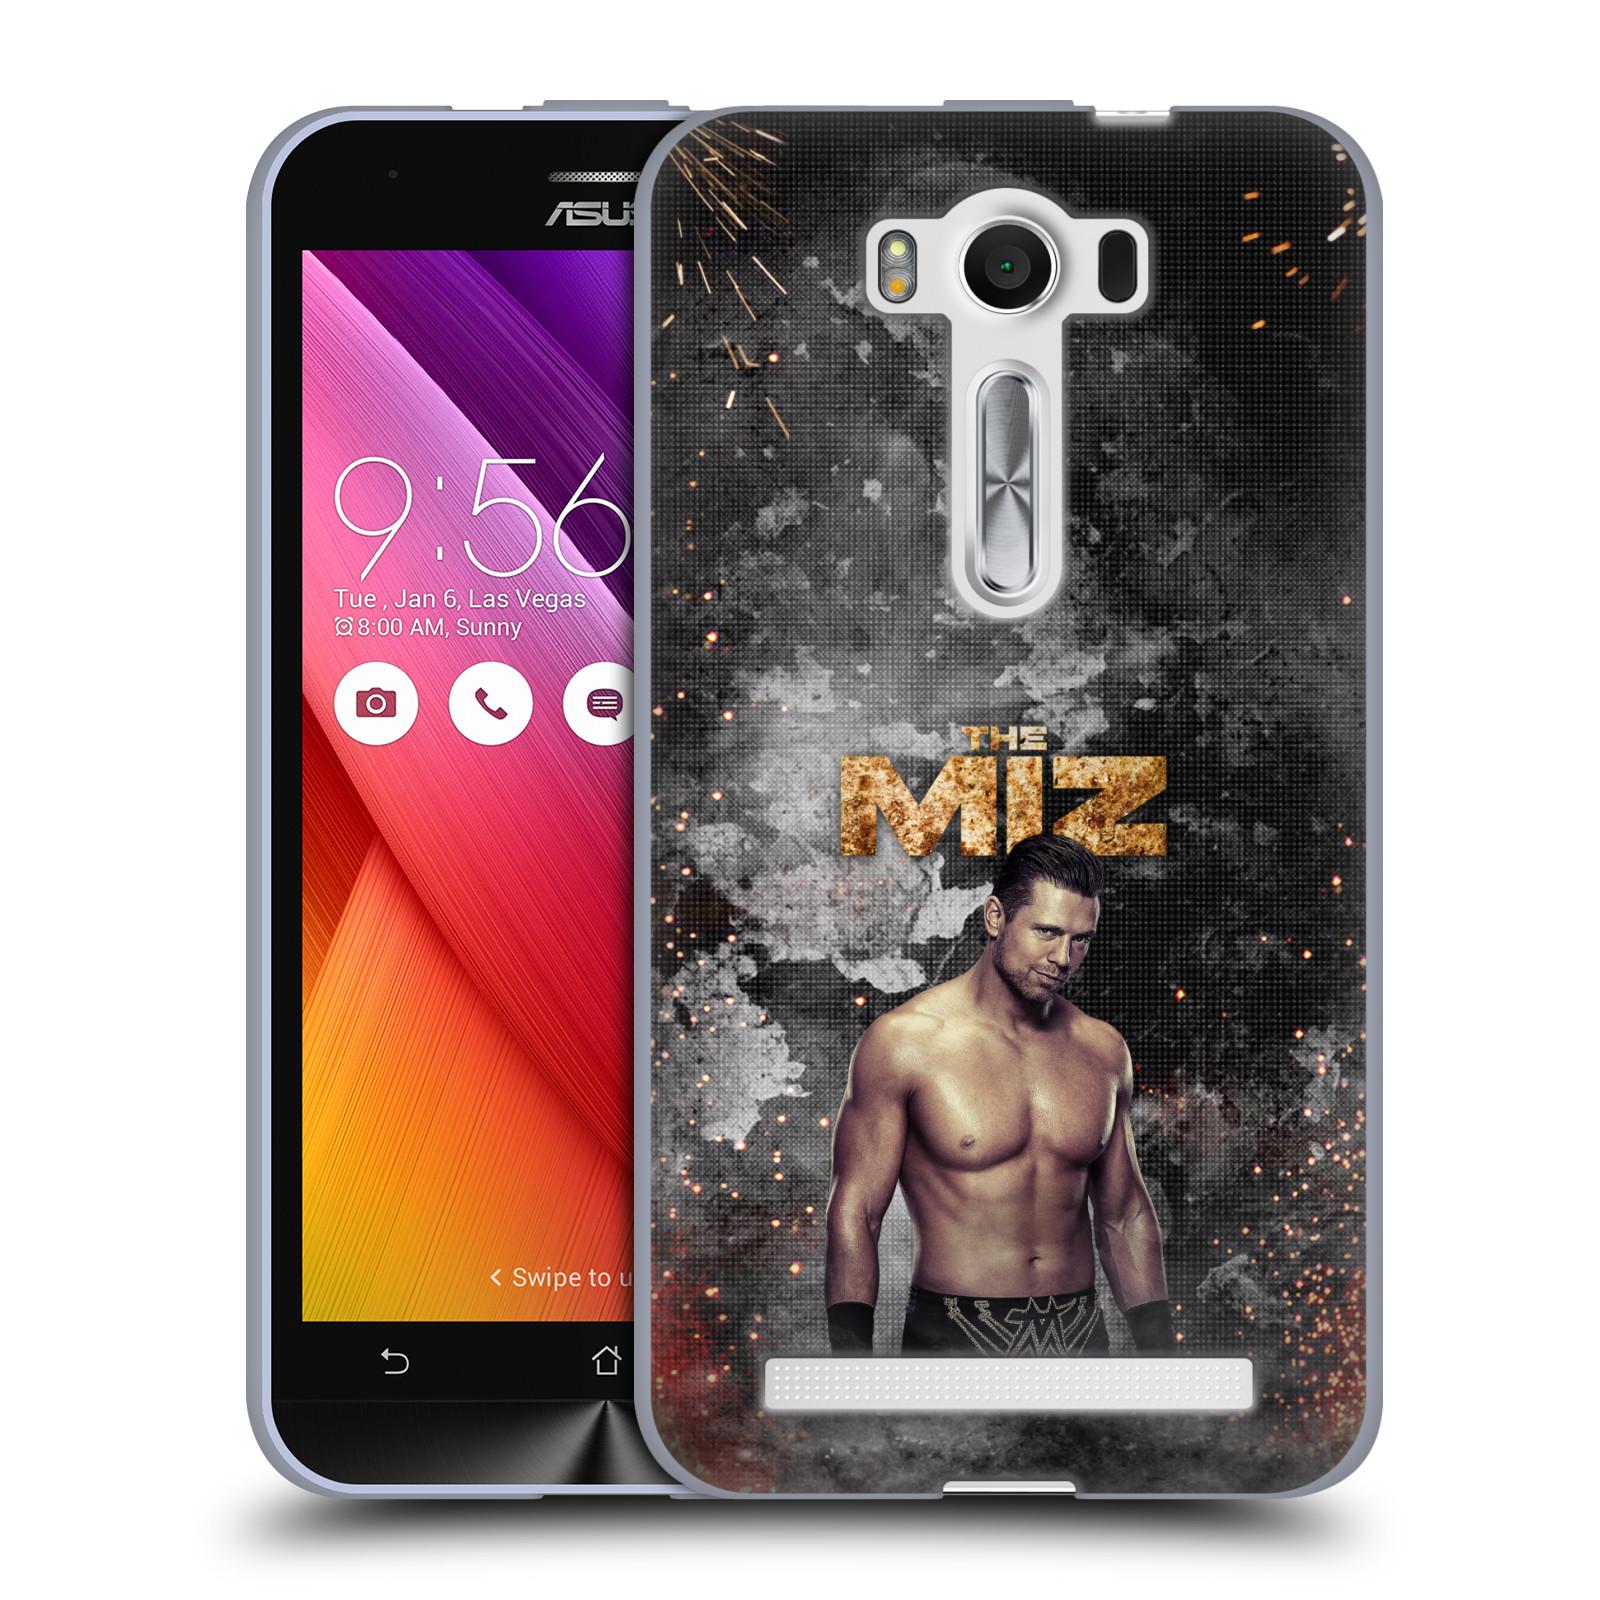 OFFICIAL WWE THE MIZ SOFT GEL CASE FOR ASUS ZENFONE PHONES